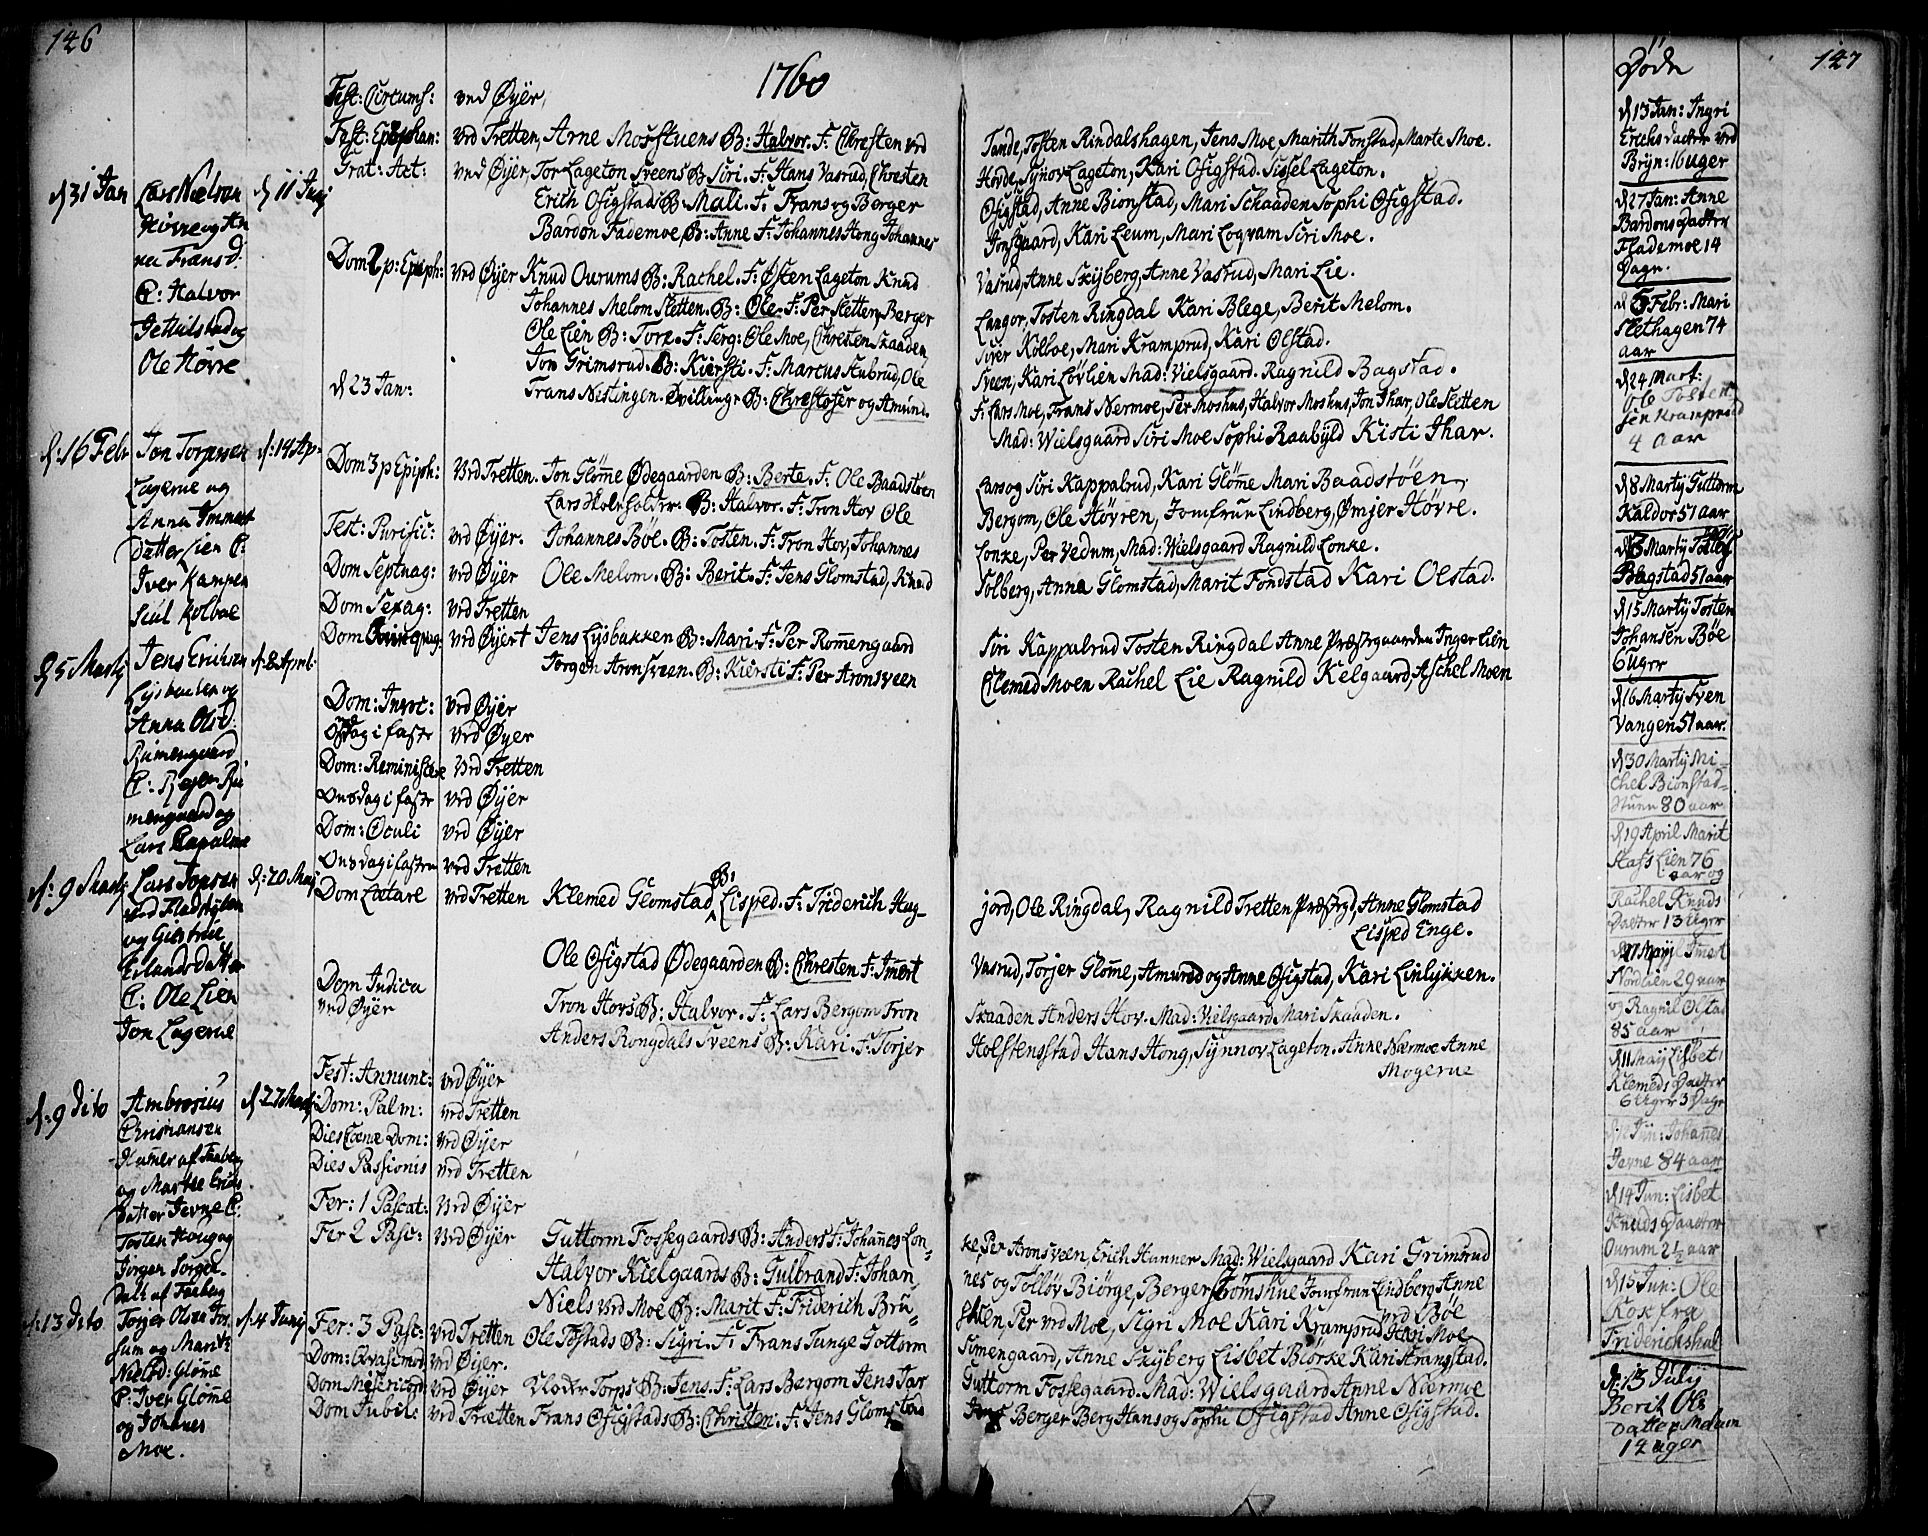 SAH, Øyer prestekontor, Ministerialbok nr. 2, 1733-1784, s. 146-147